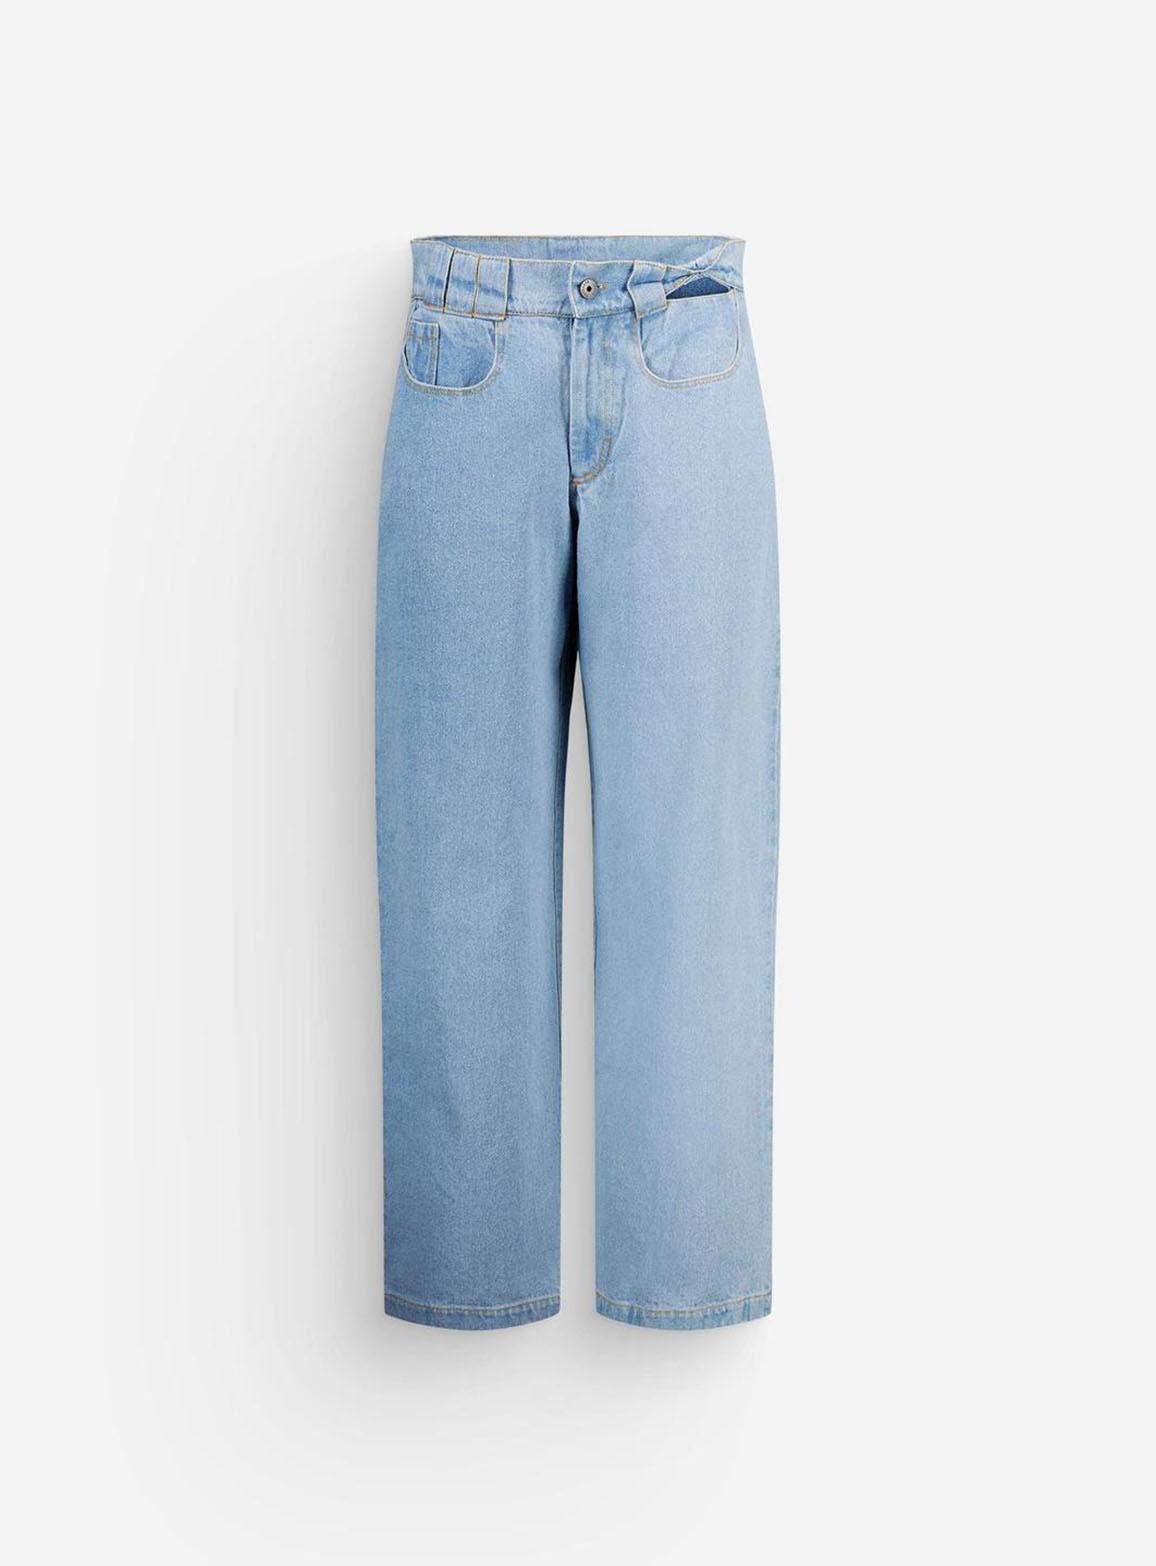 Blue torcido jeans